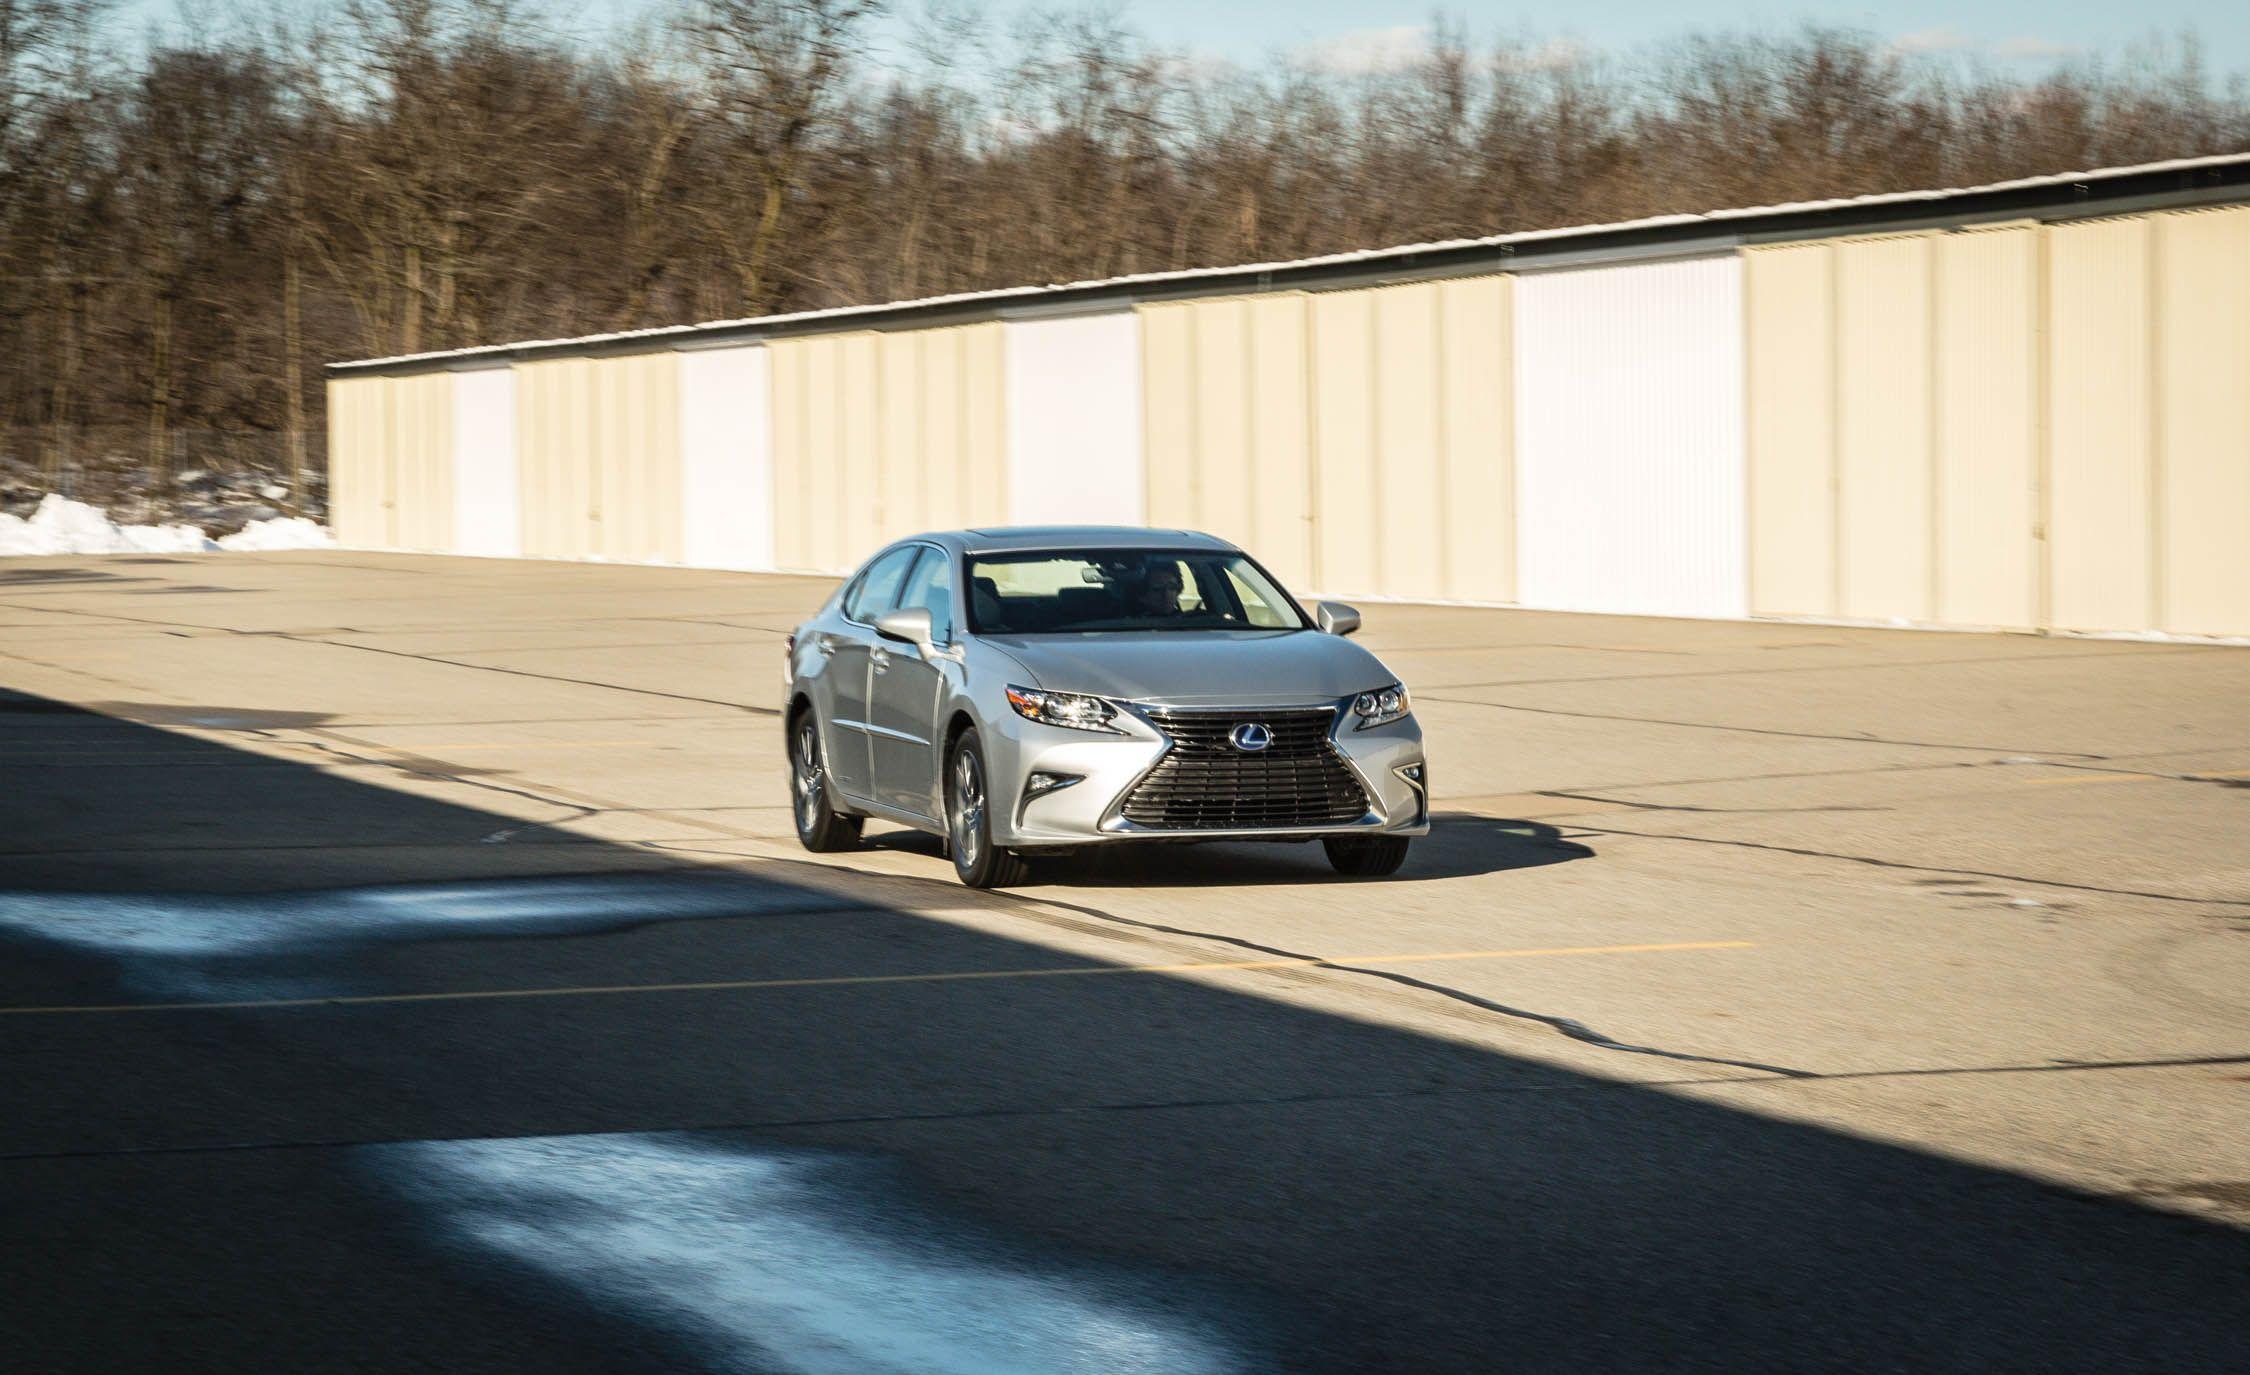 2017 Lexus ES300h Gallery